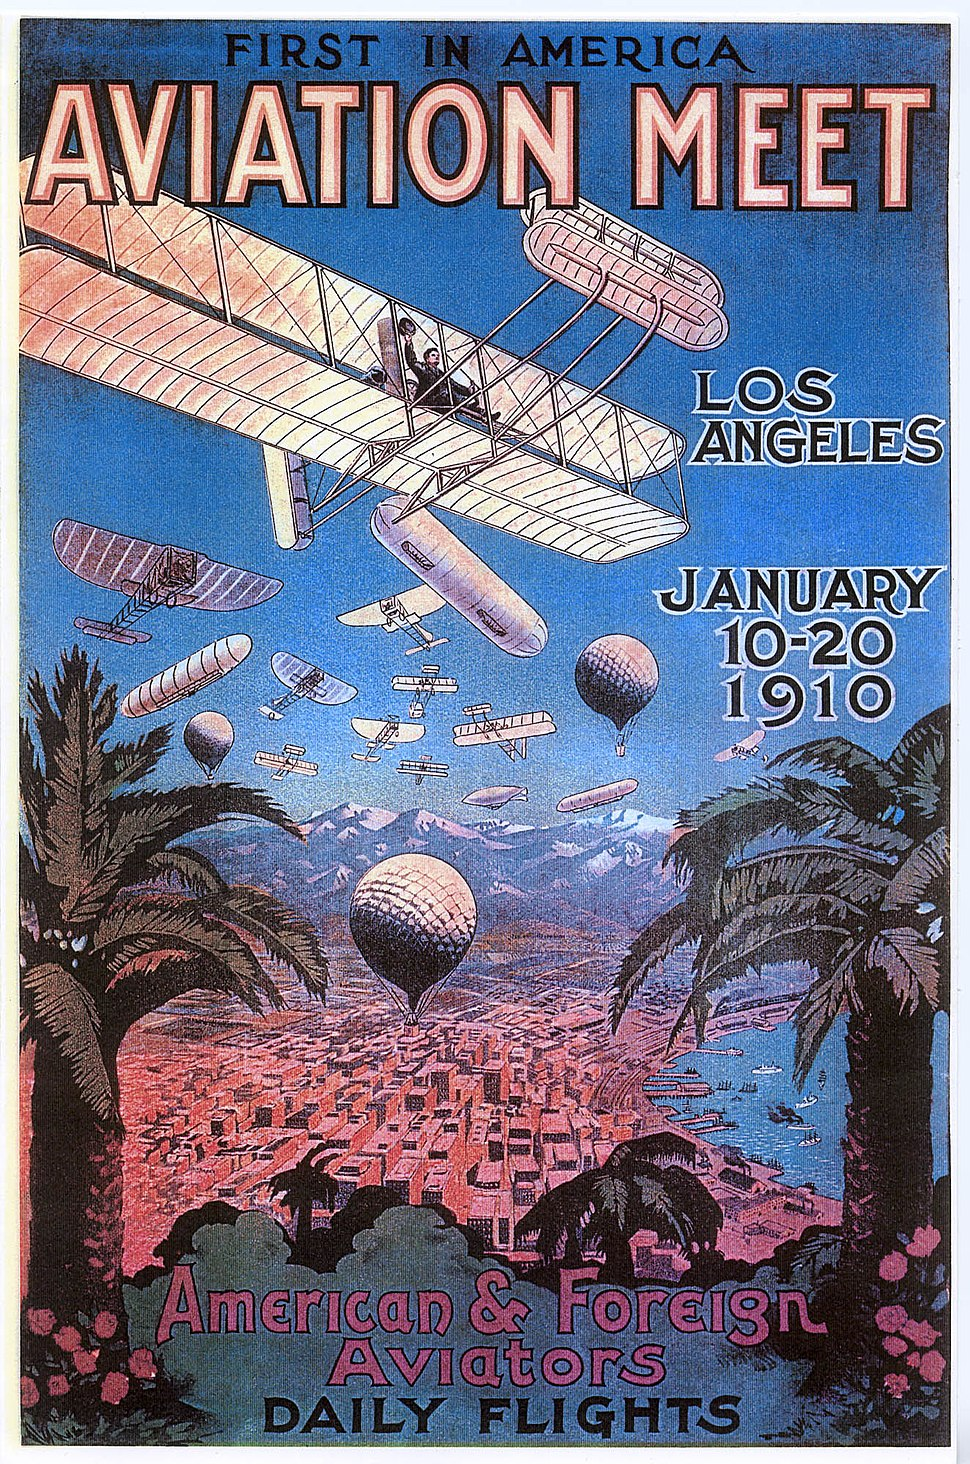 1910 Airmeet Poster